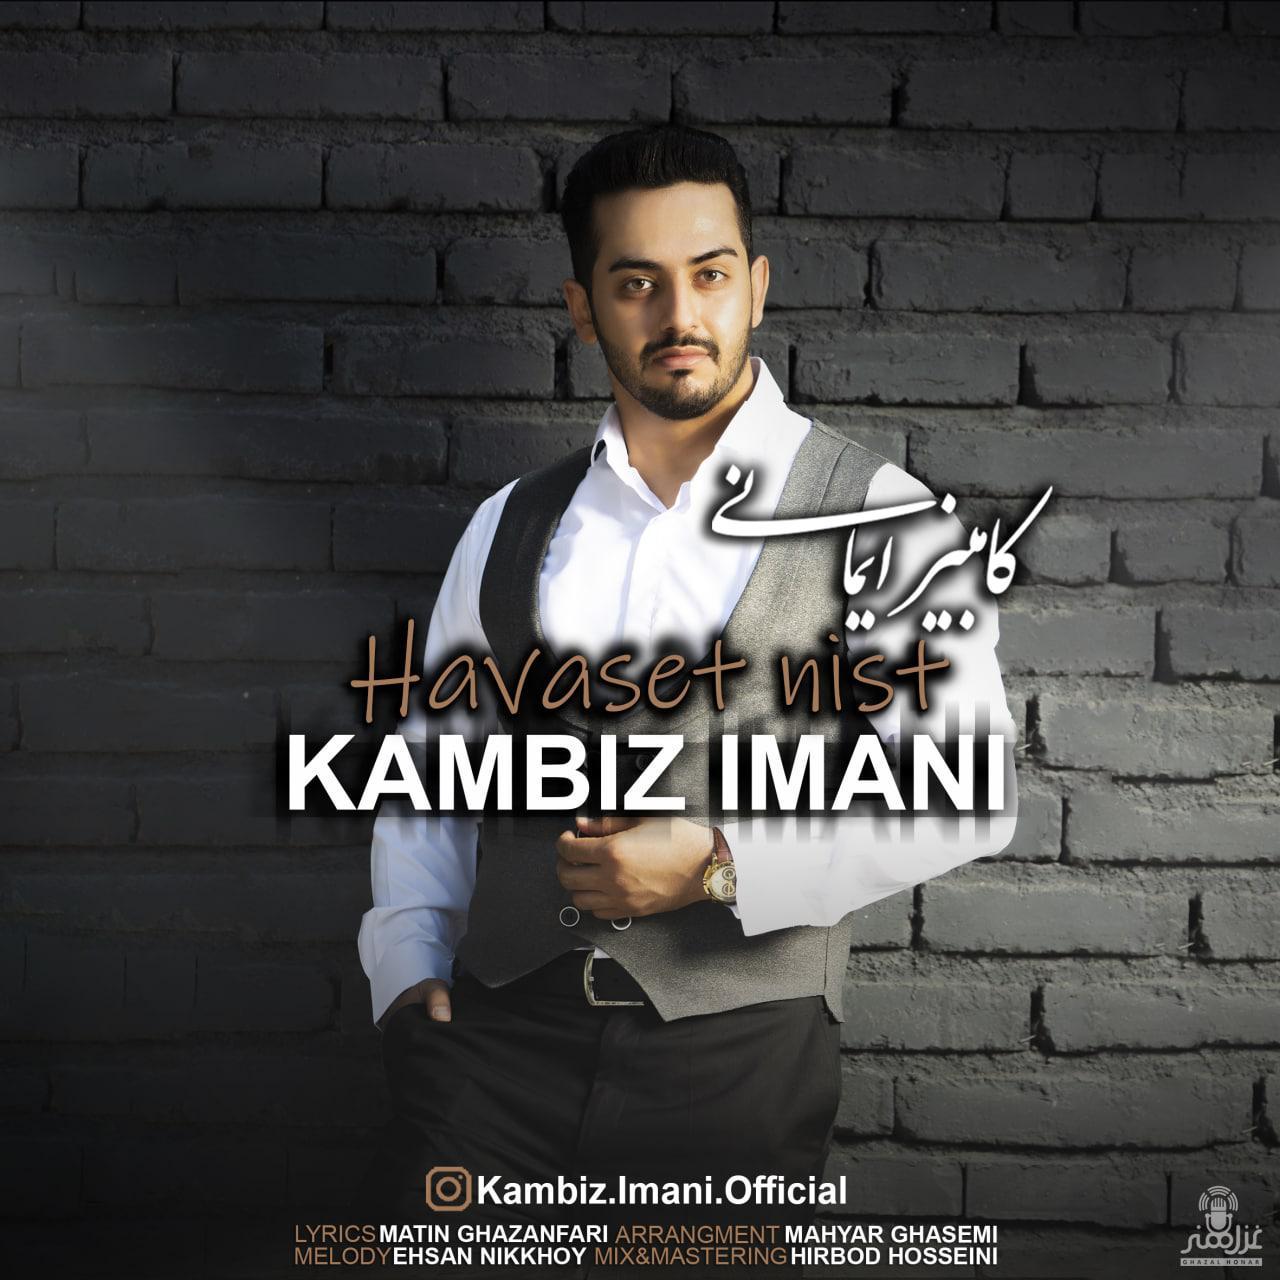 Kambiz Imani – Havaset Nist